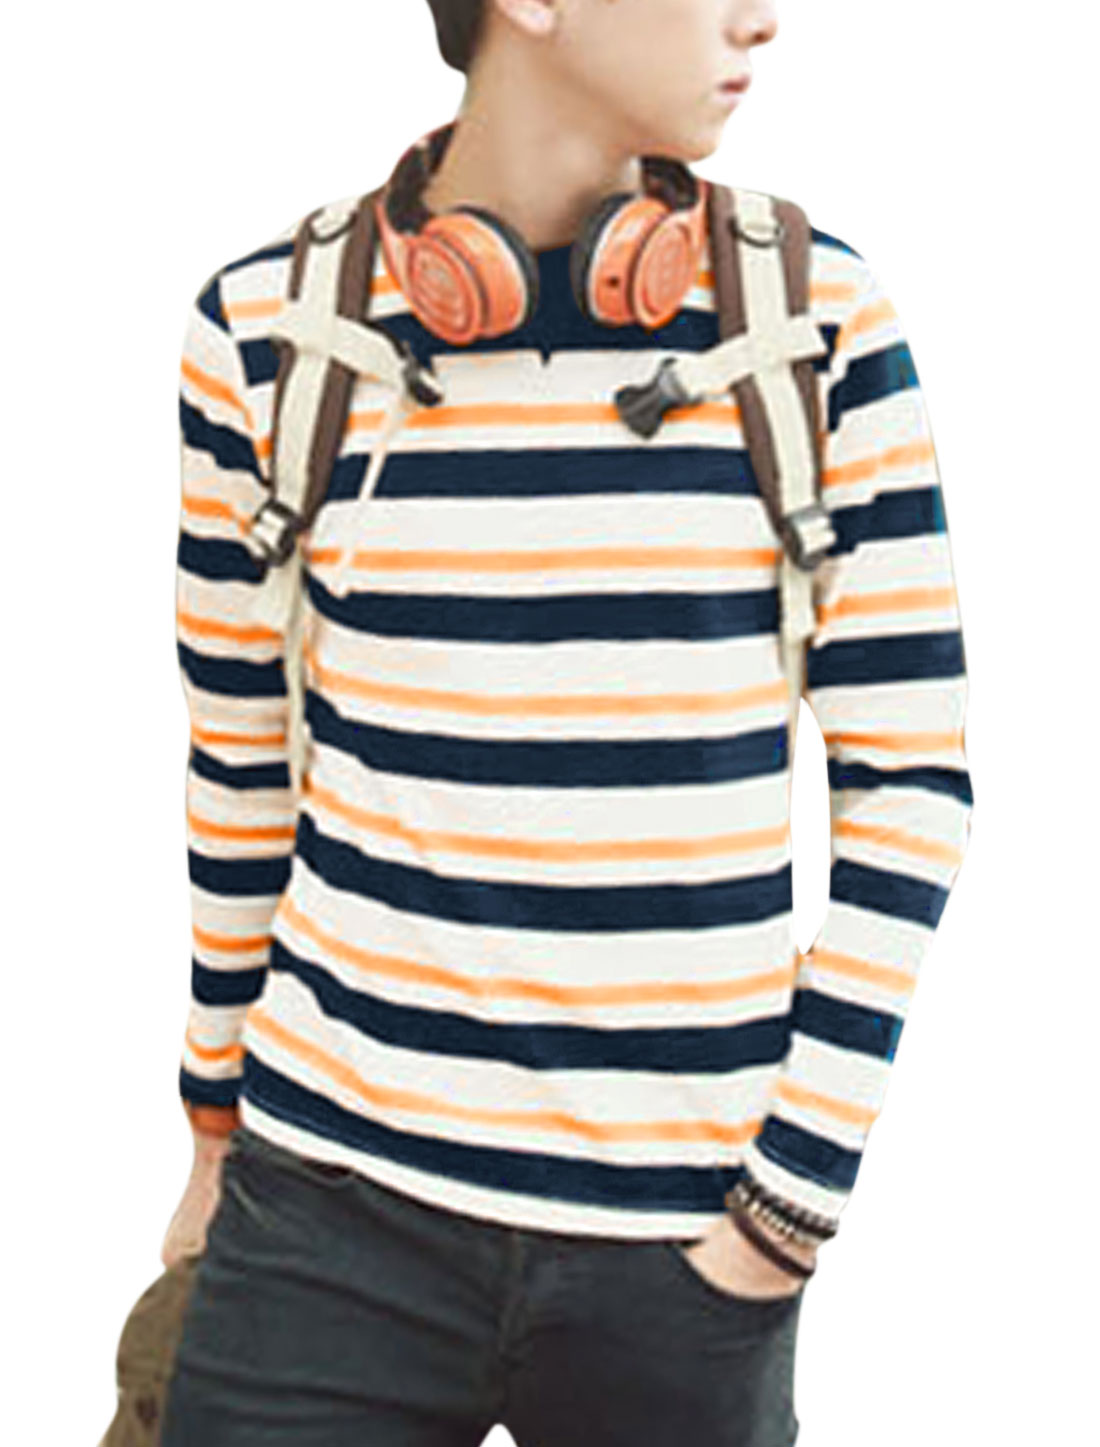 Men Round Neck Long Sleeve Bar Striped Casual T-Shirt White Orange M